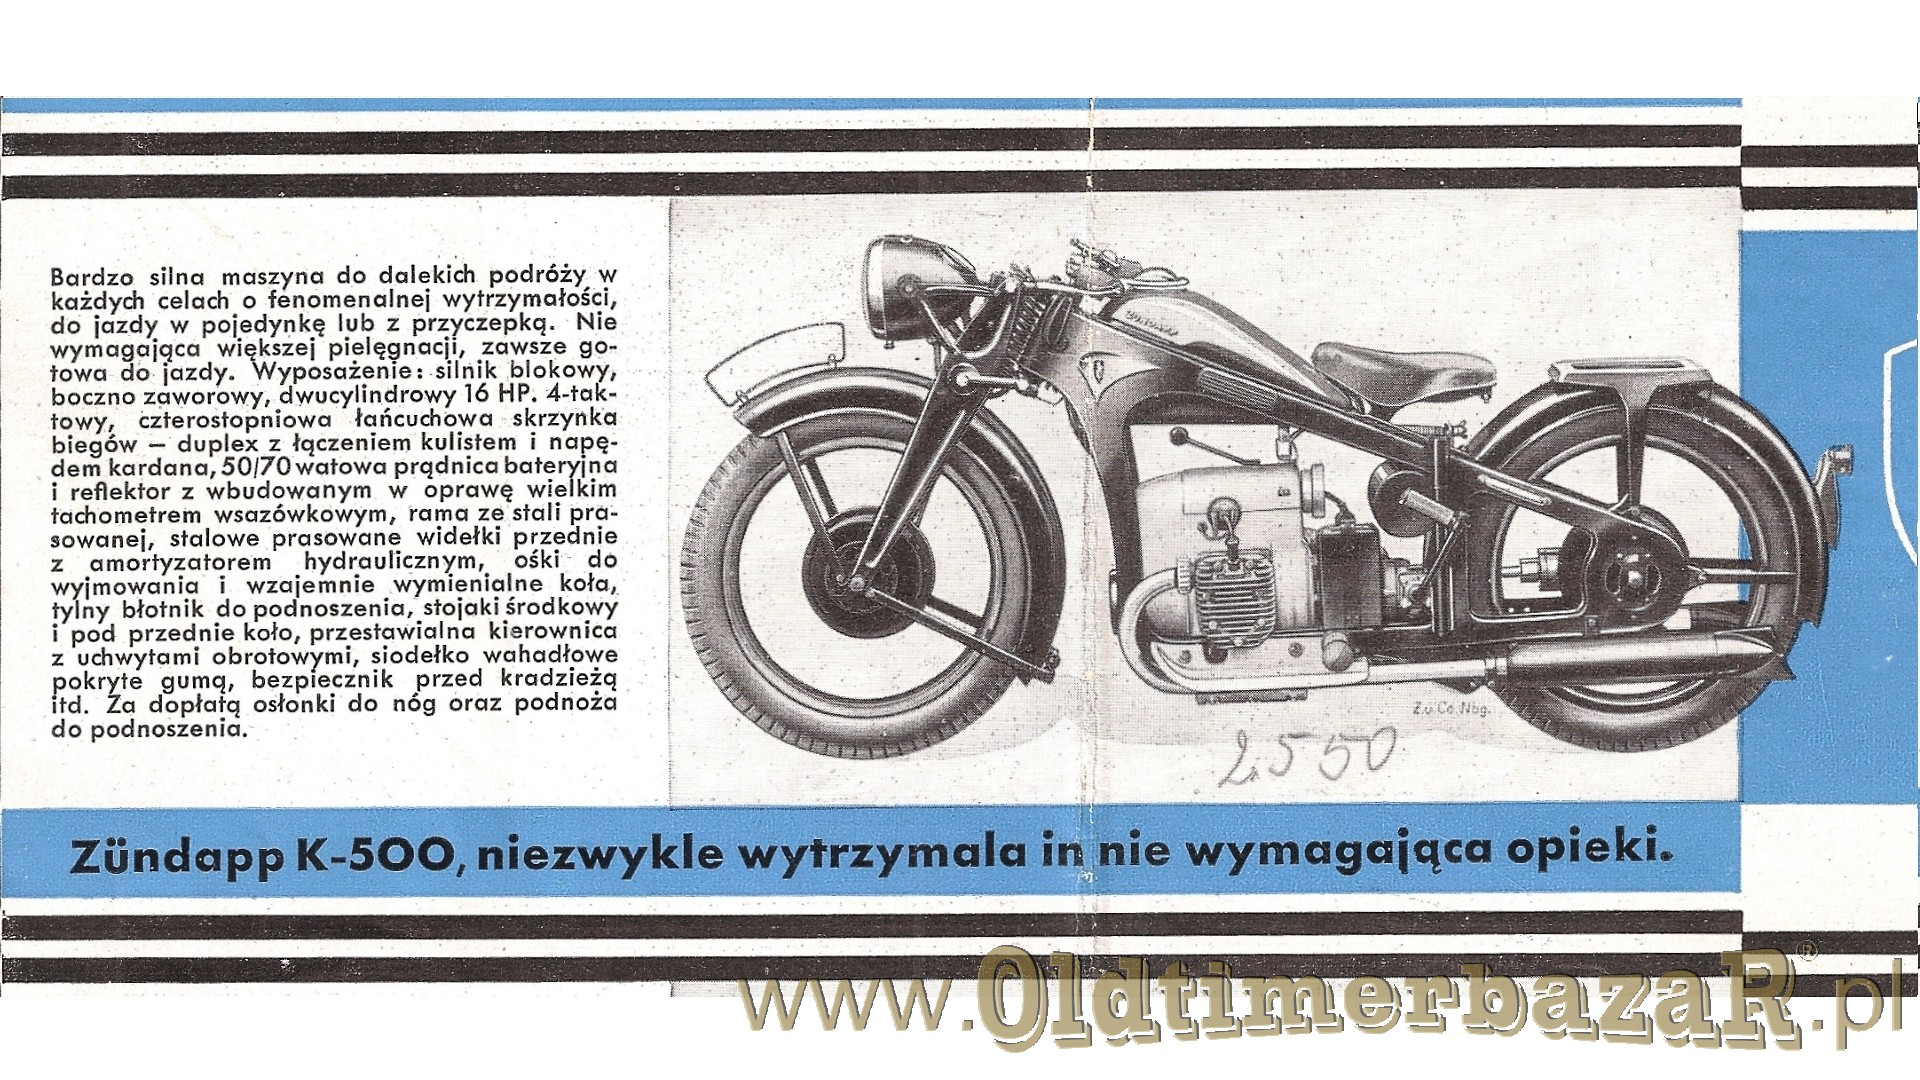 Zundapp prospekt 1938 foto 05 K500